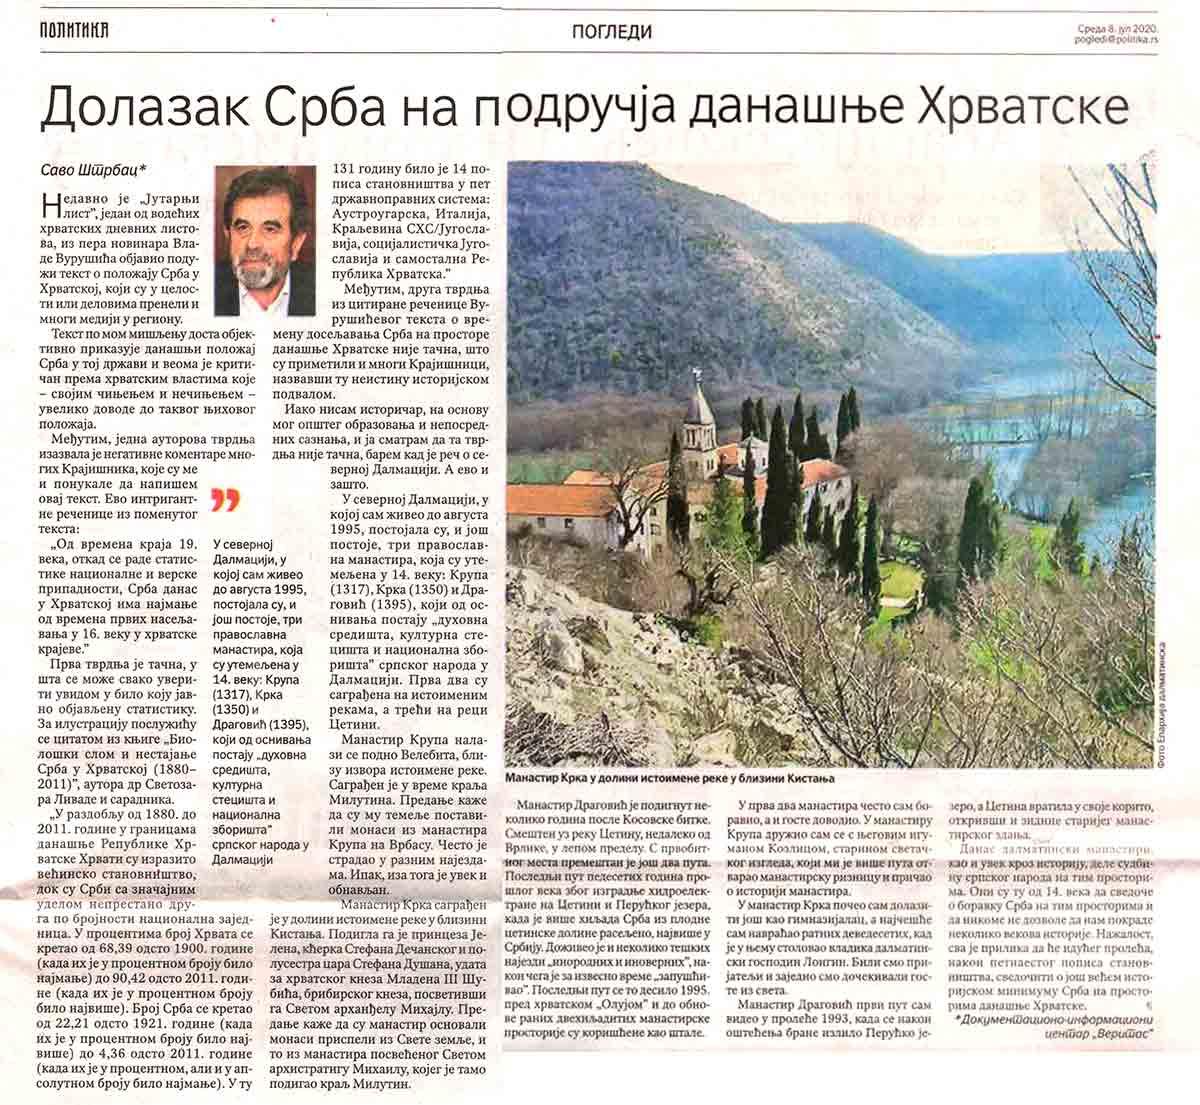 Savo Štrbac: Dolazak Srba na područja današnje Hrvatske, Politika, 8.7.20. Foto: scan